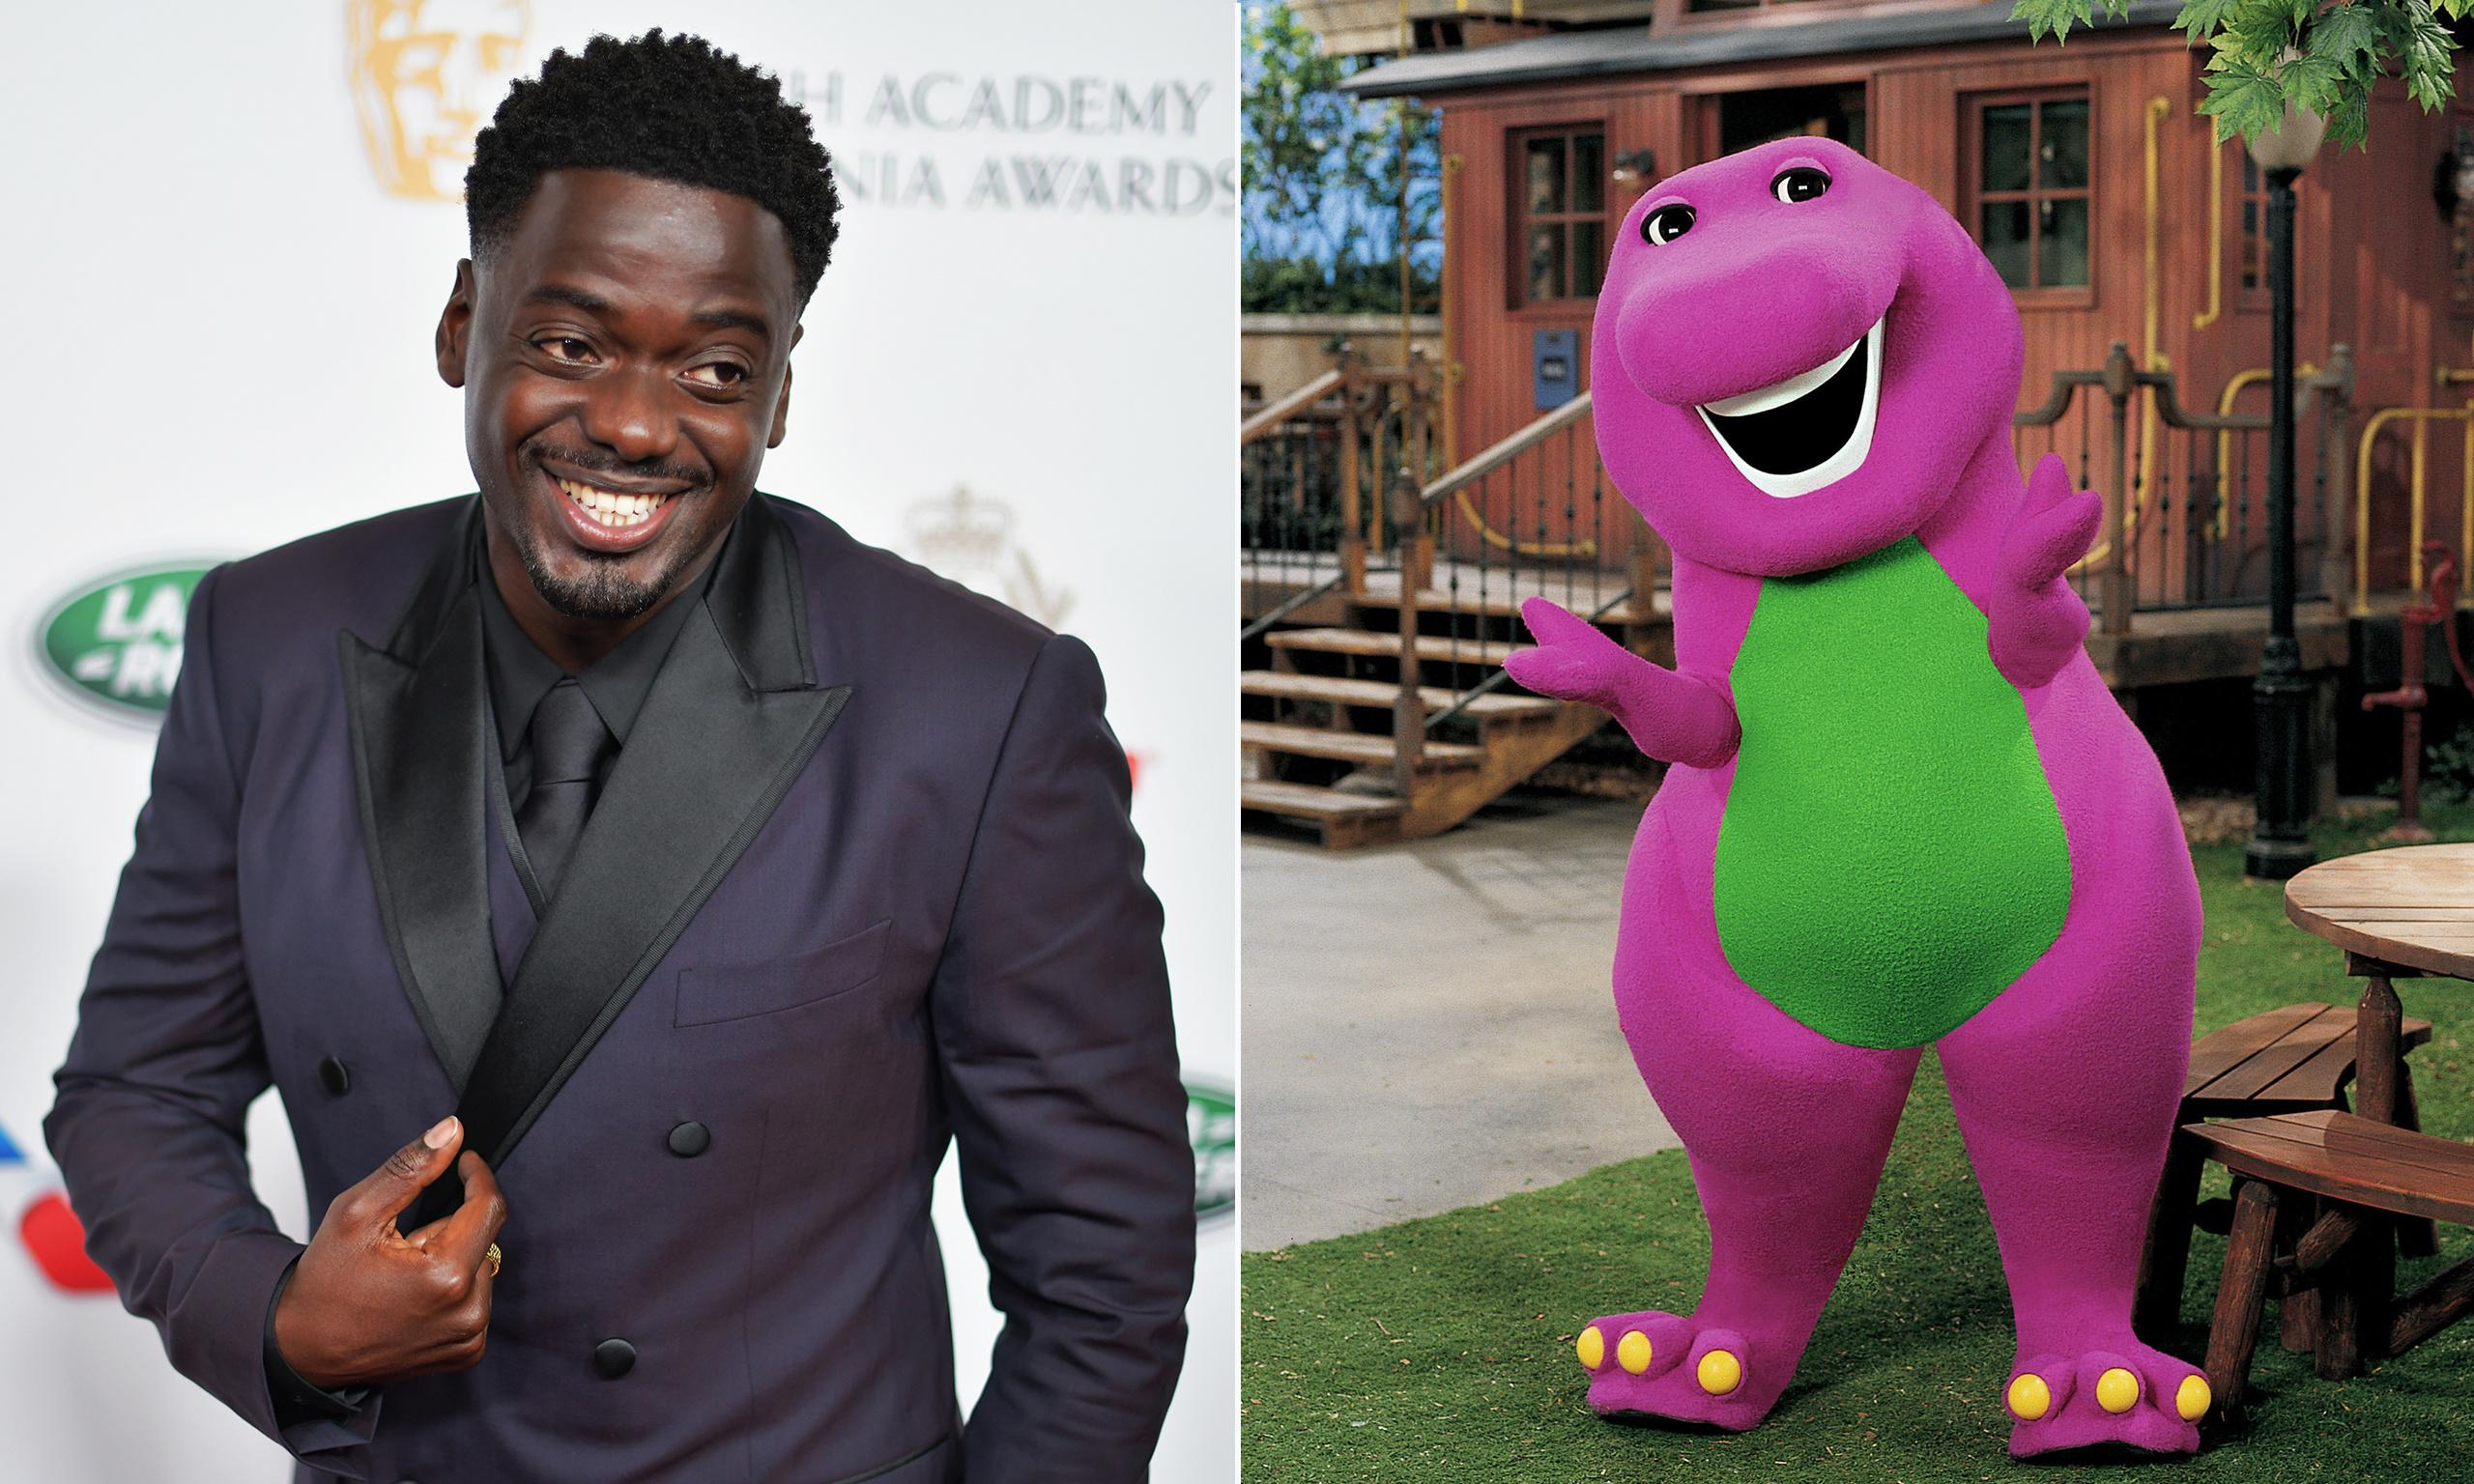 Daniel Kaluuya to produce live-action Barney the Dinosaur movie